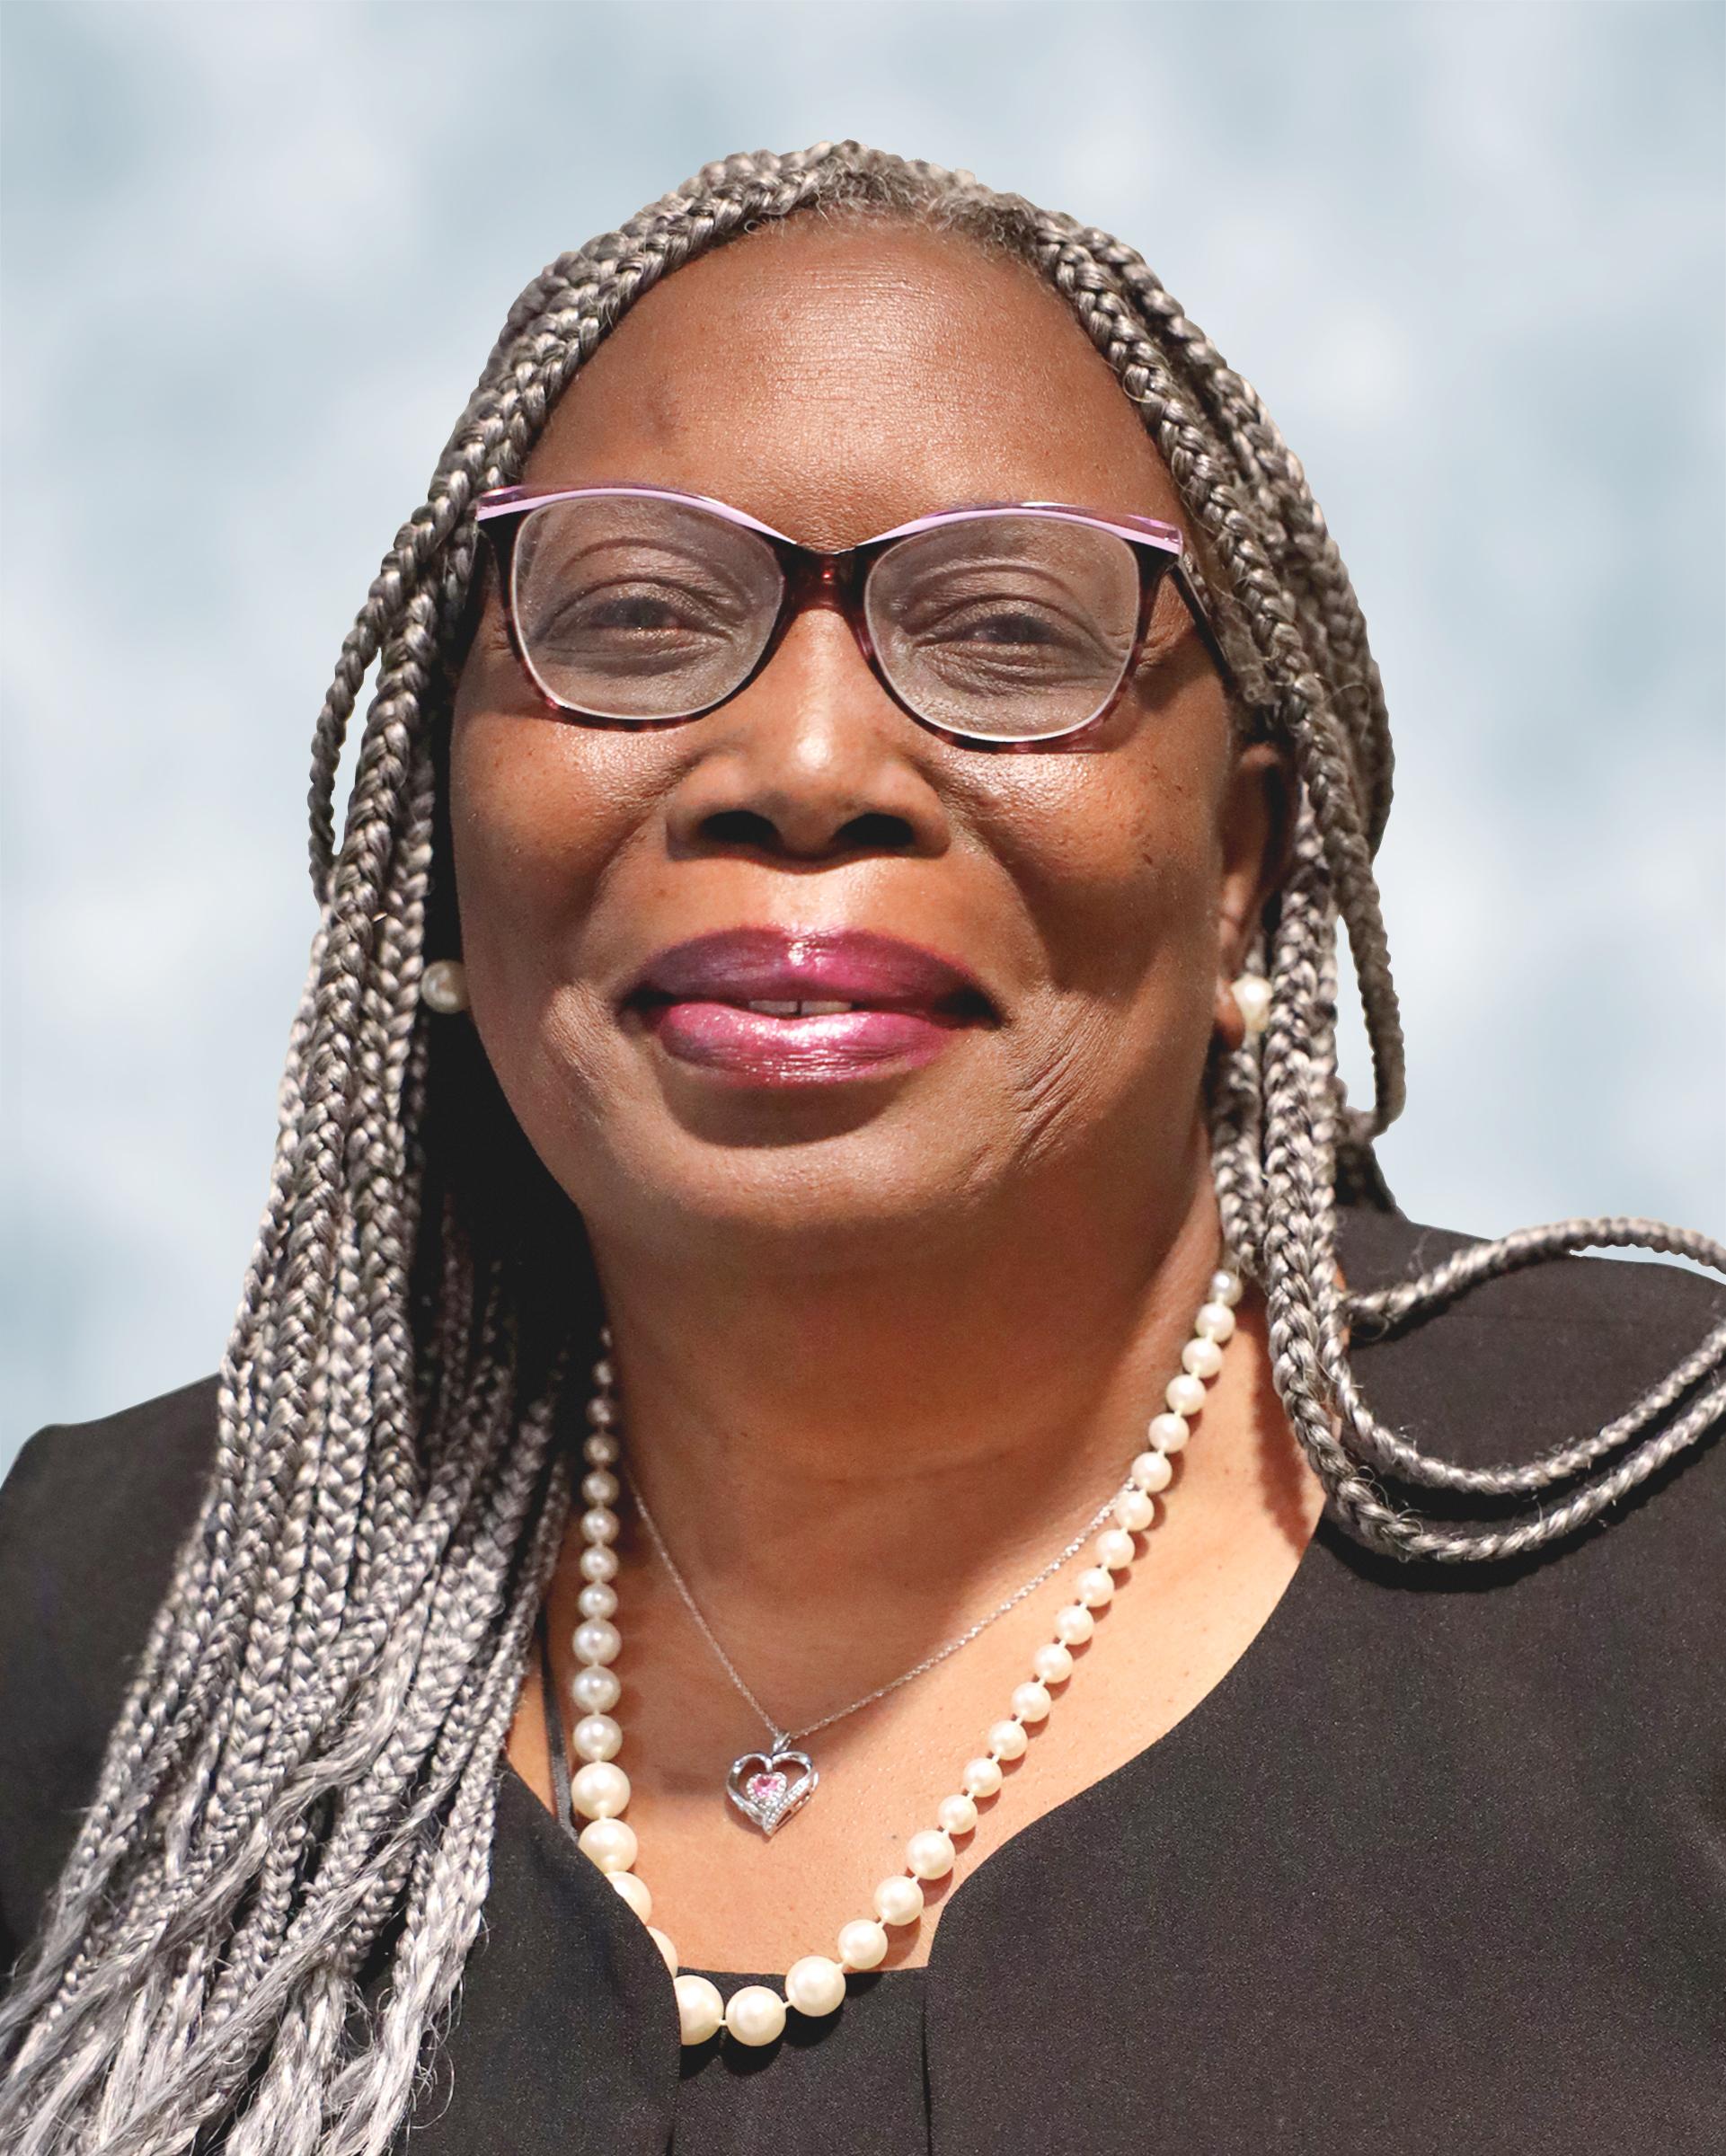 Ms. Deborah Maxwell